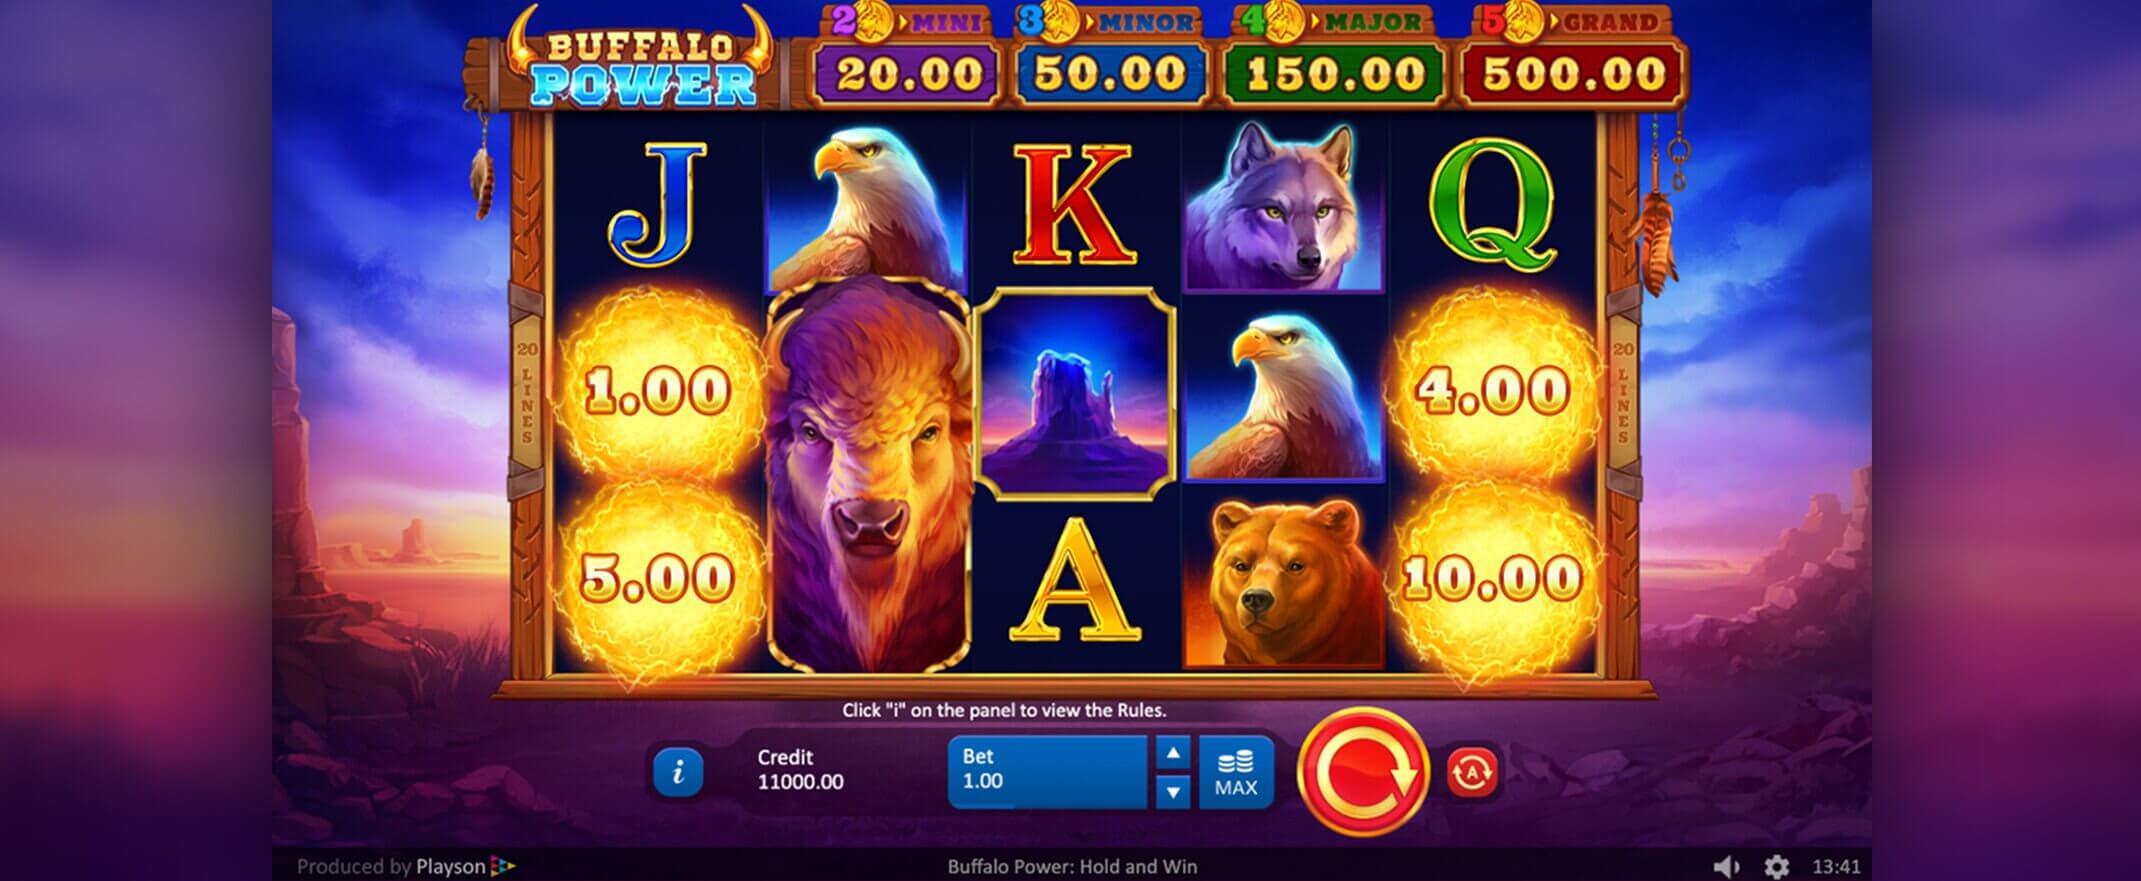 Buffalo Power Hold and Win Slot Gameplay